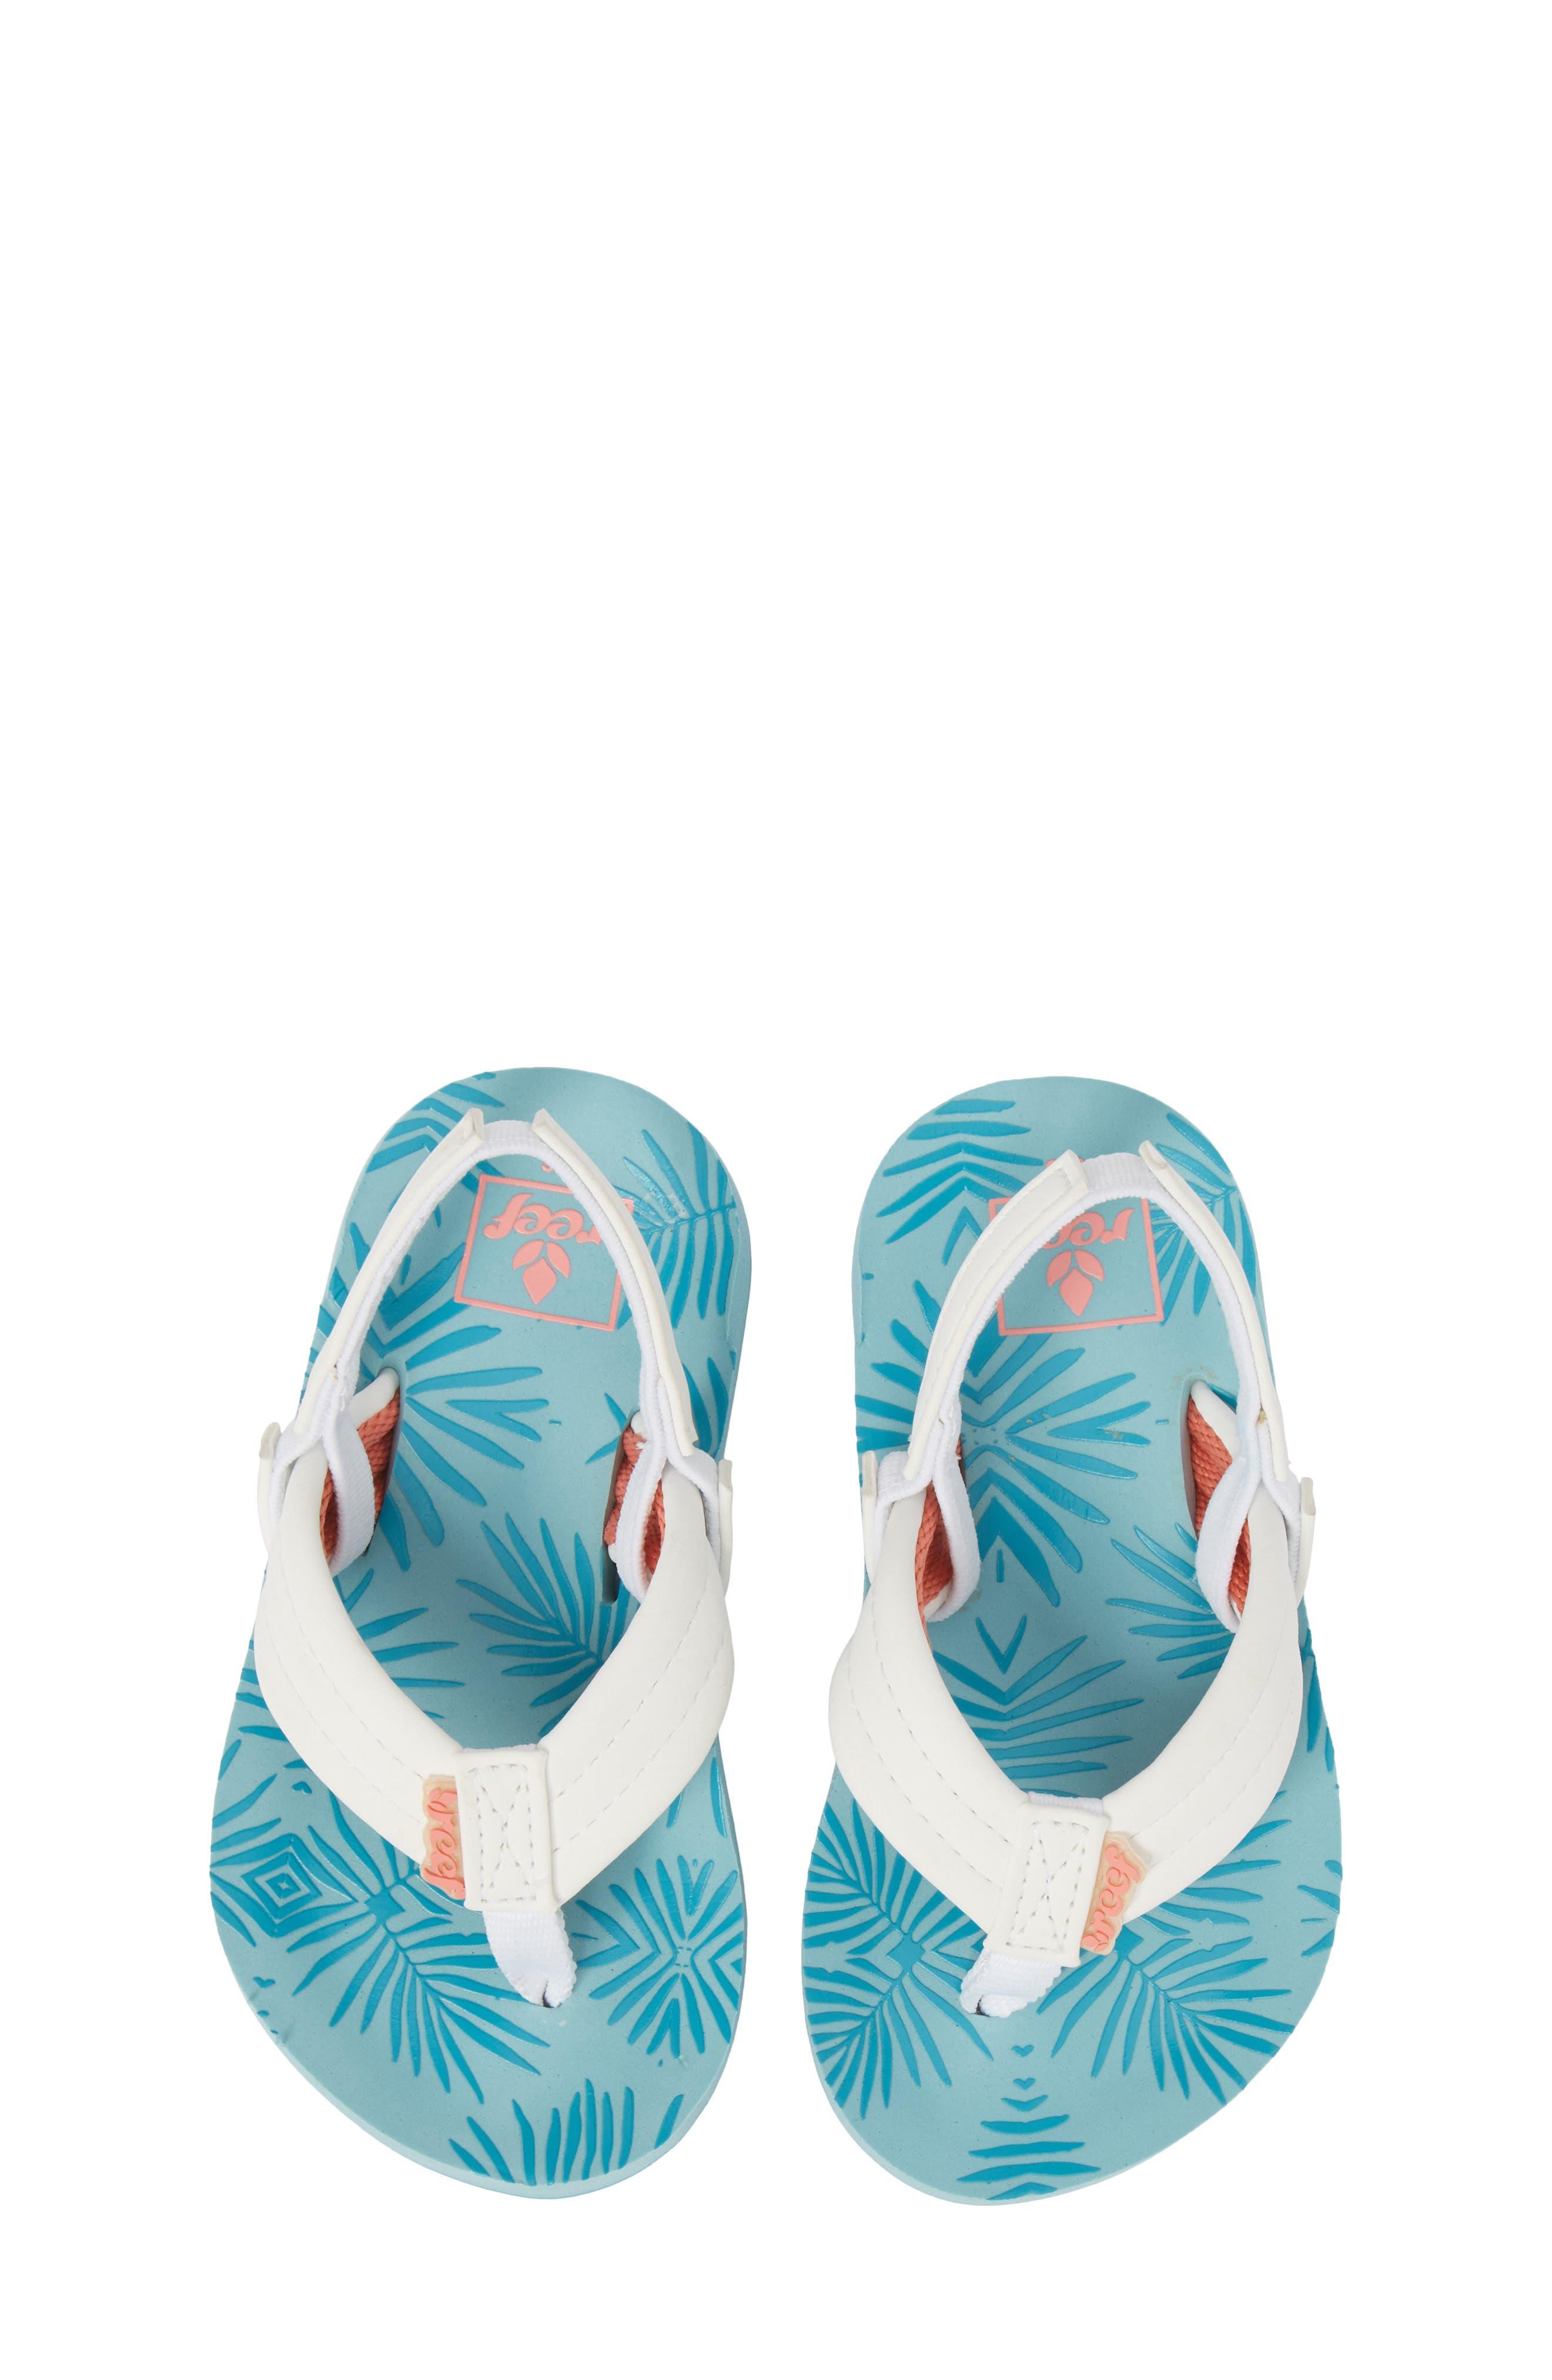 Little Reef Footprints Sandal,                             Main thumbnail 1, color,                             403